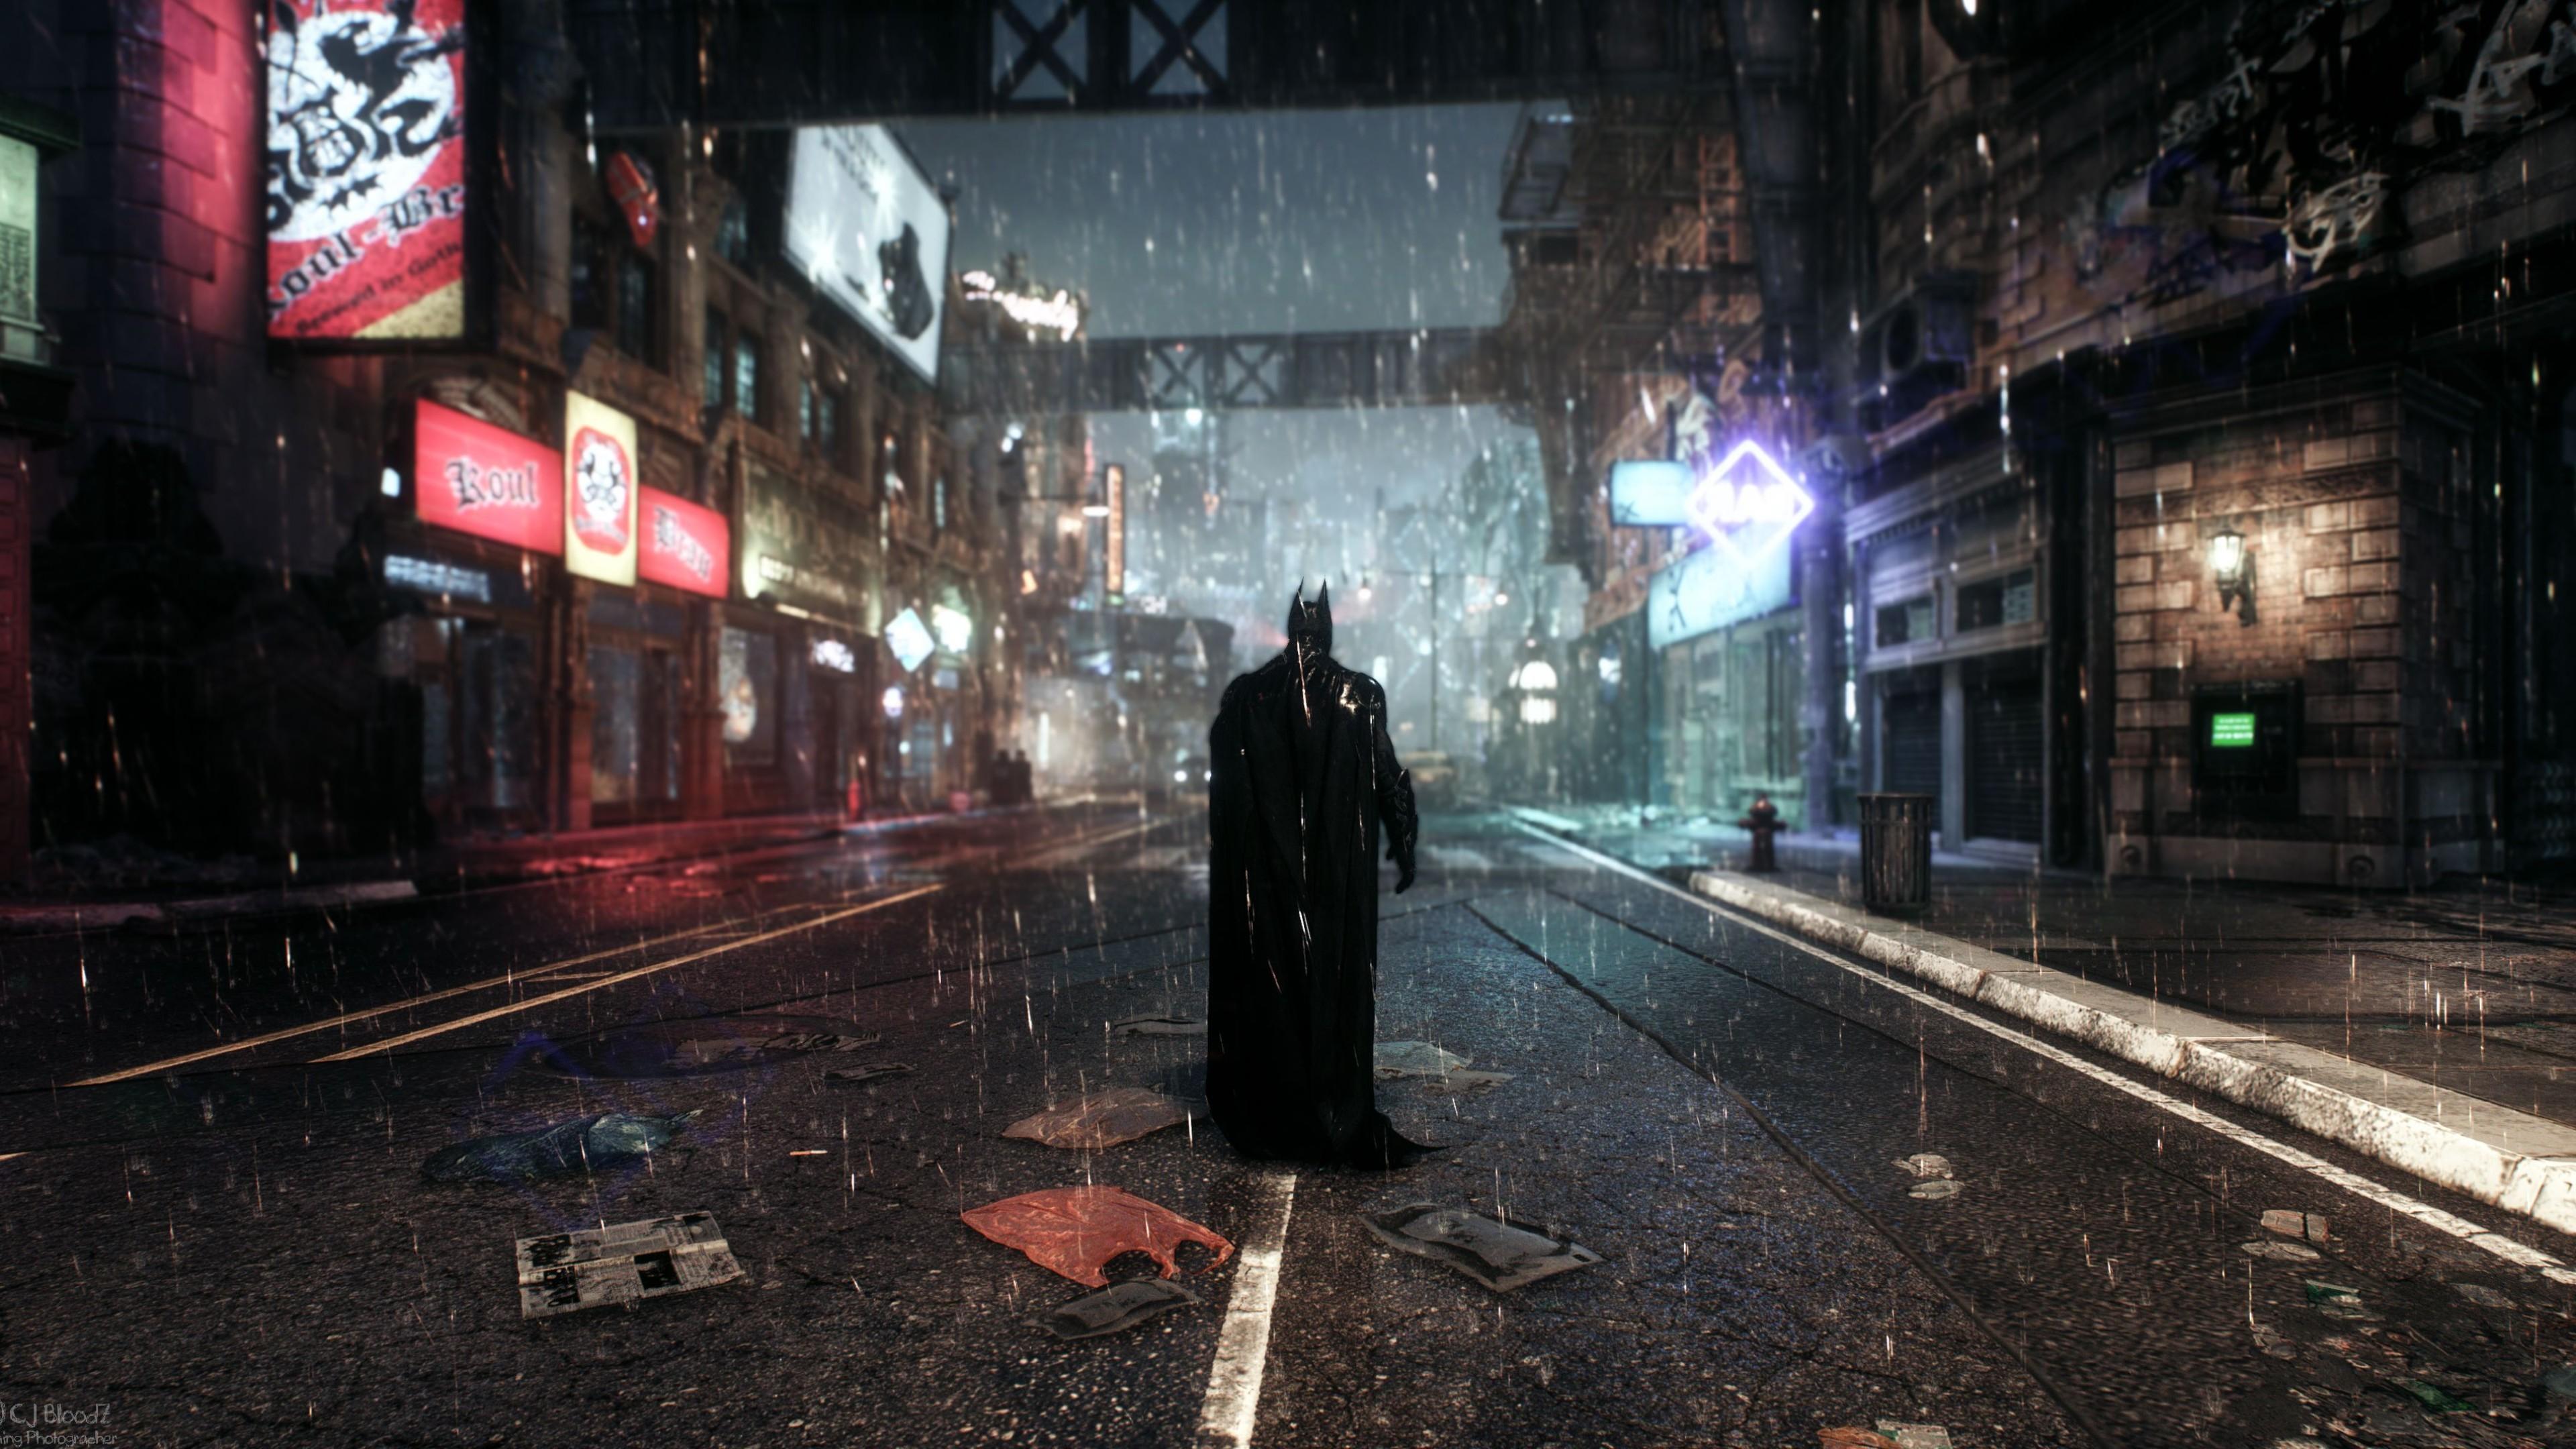 batman arkham knight 4k game 2019 ya 3840x2160 1 - Batman Arkham Knight 2019 - Batman Arkham Knight 4k wallpapers, Batman Arkham Knight 2019 game wallpaper 4k